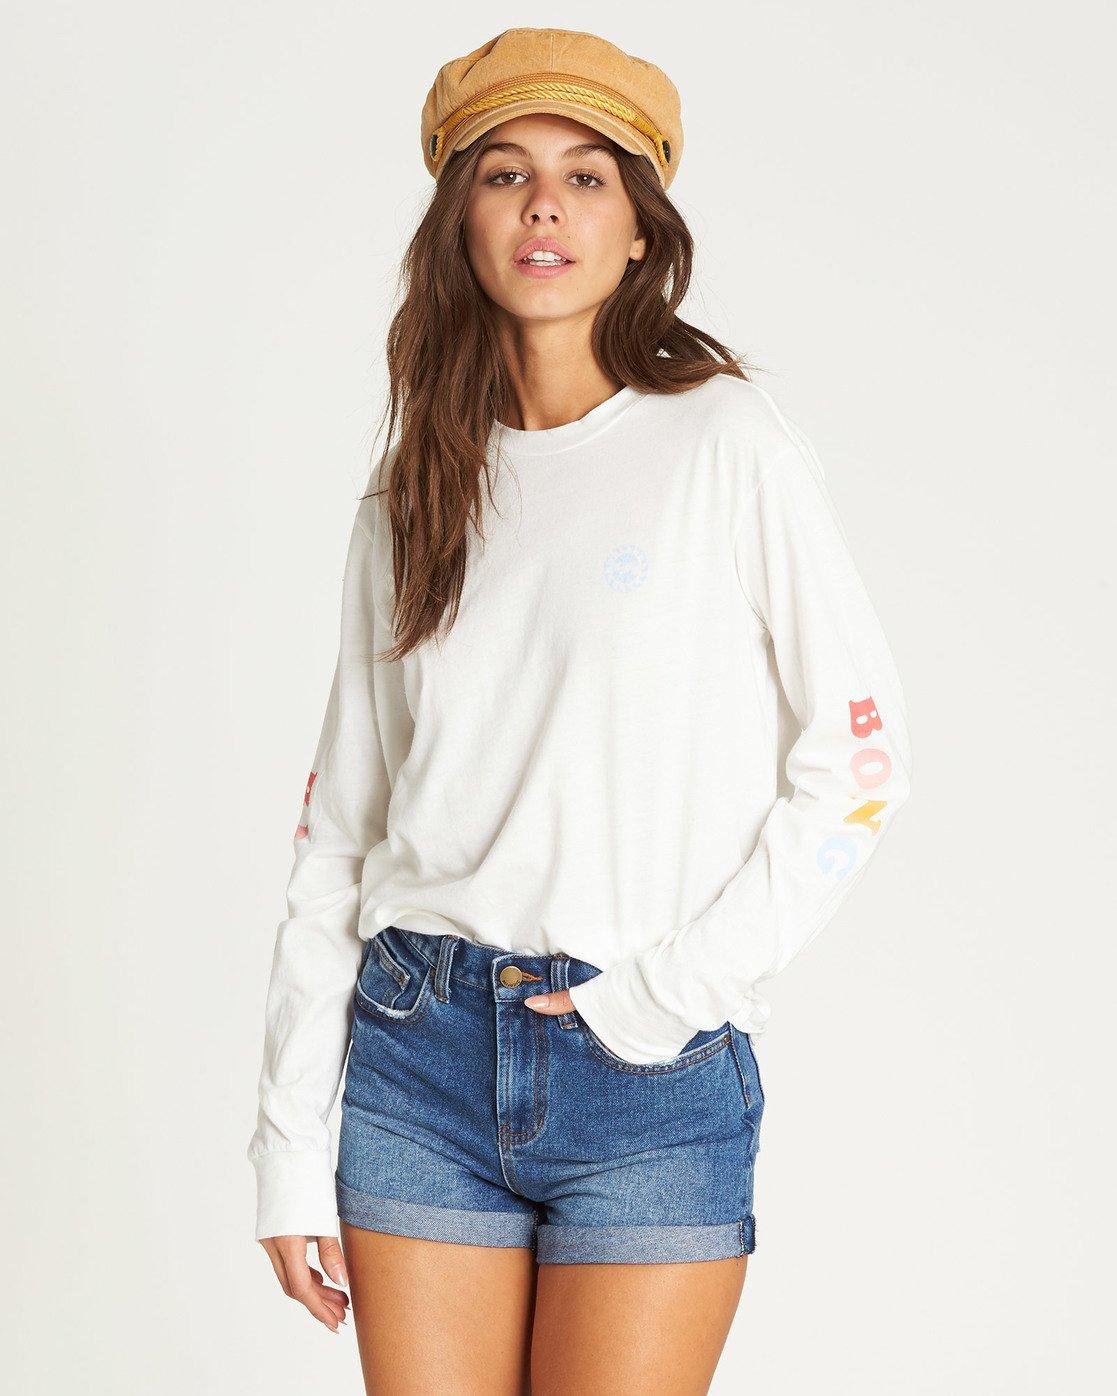 Billabong Play Time Long Sleeve Top Cool Wip Billabong Women/'s Clothing